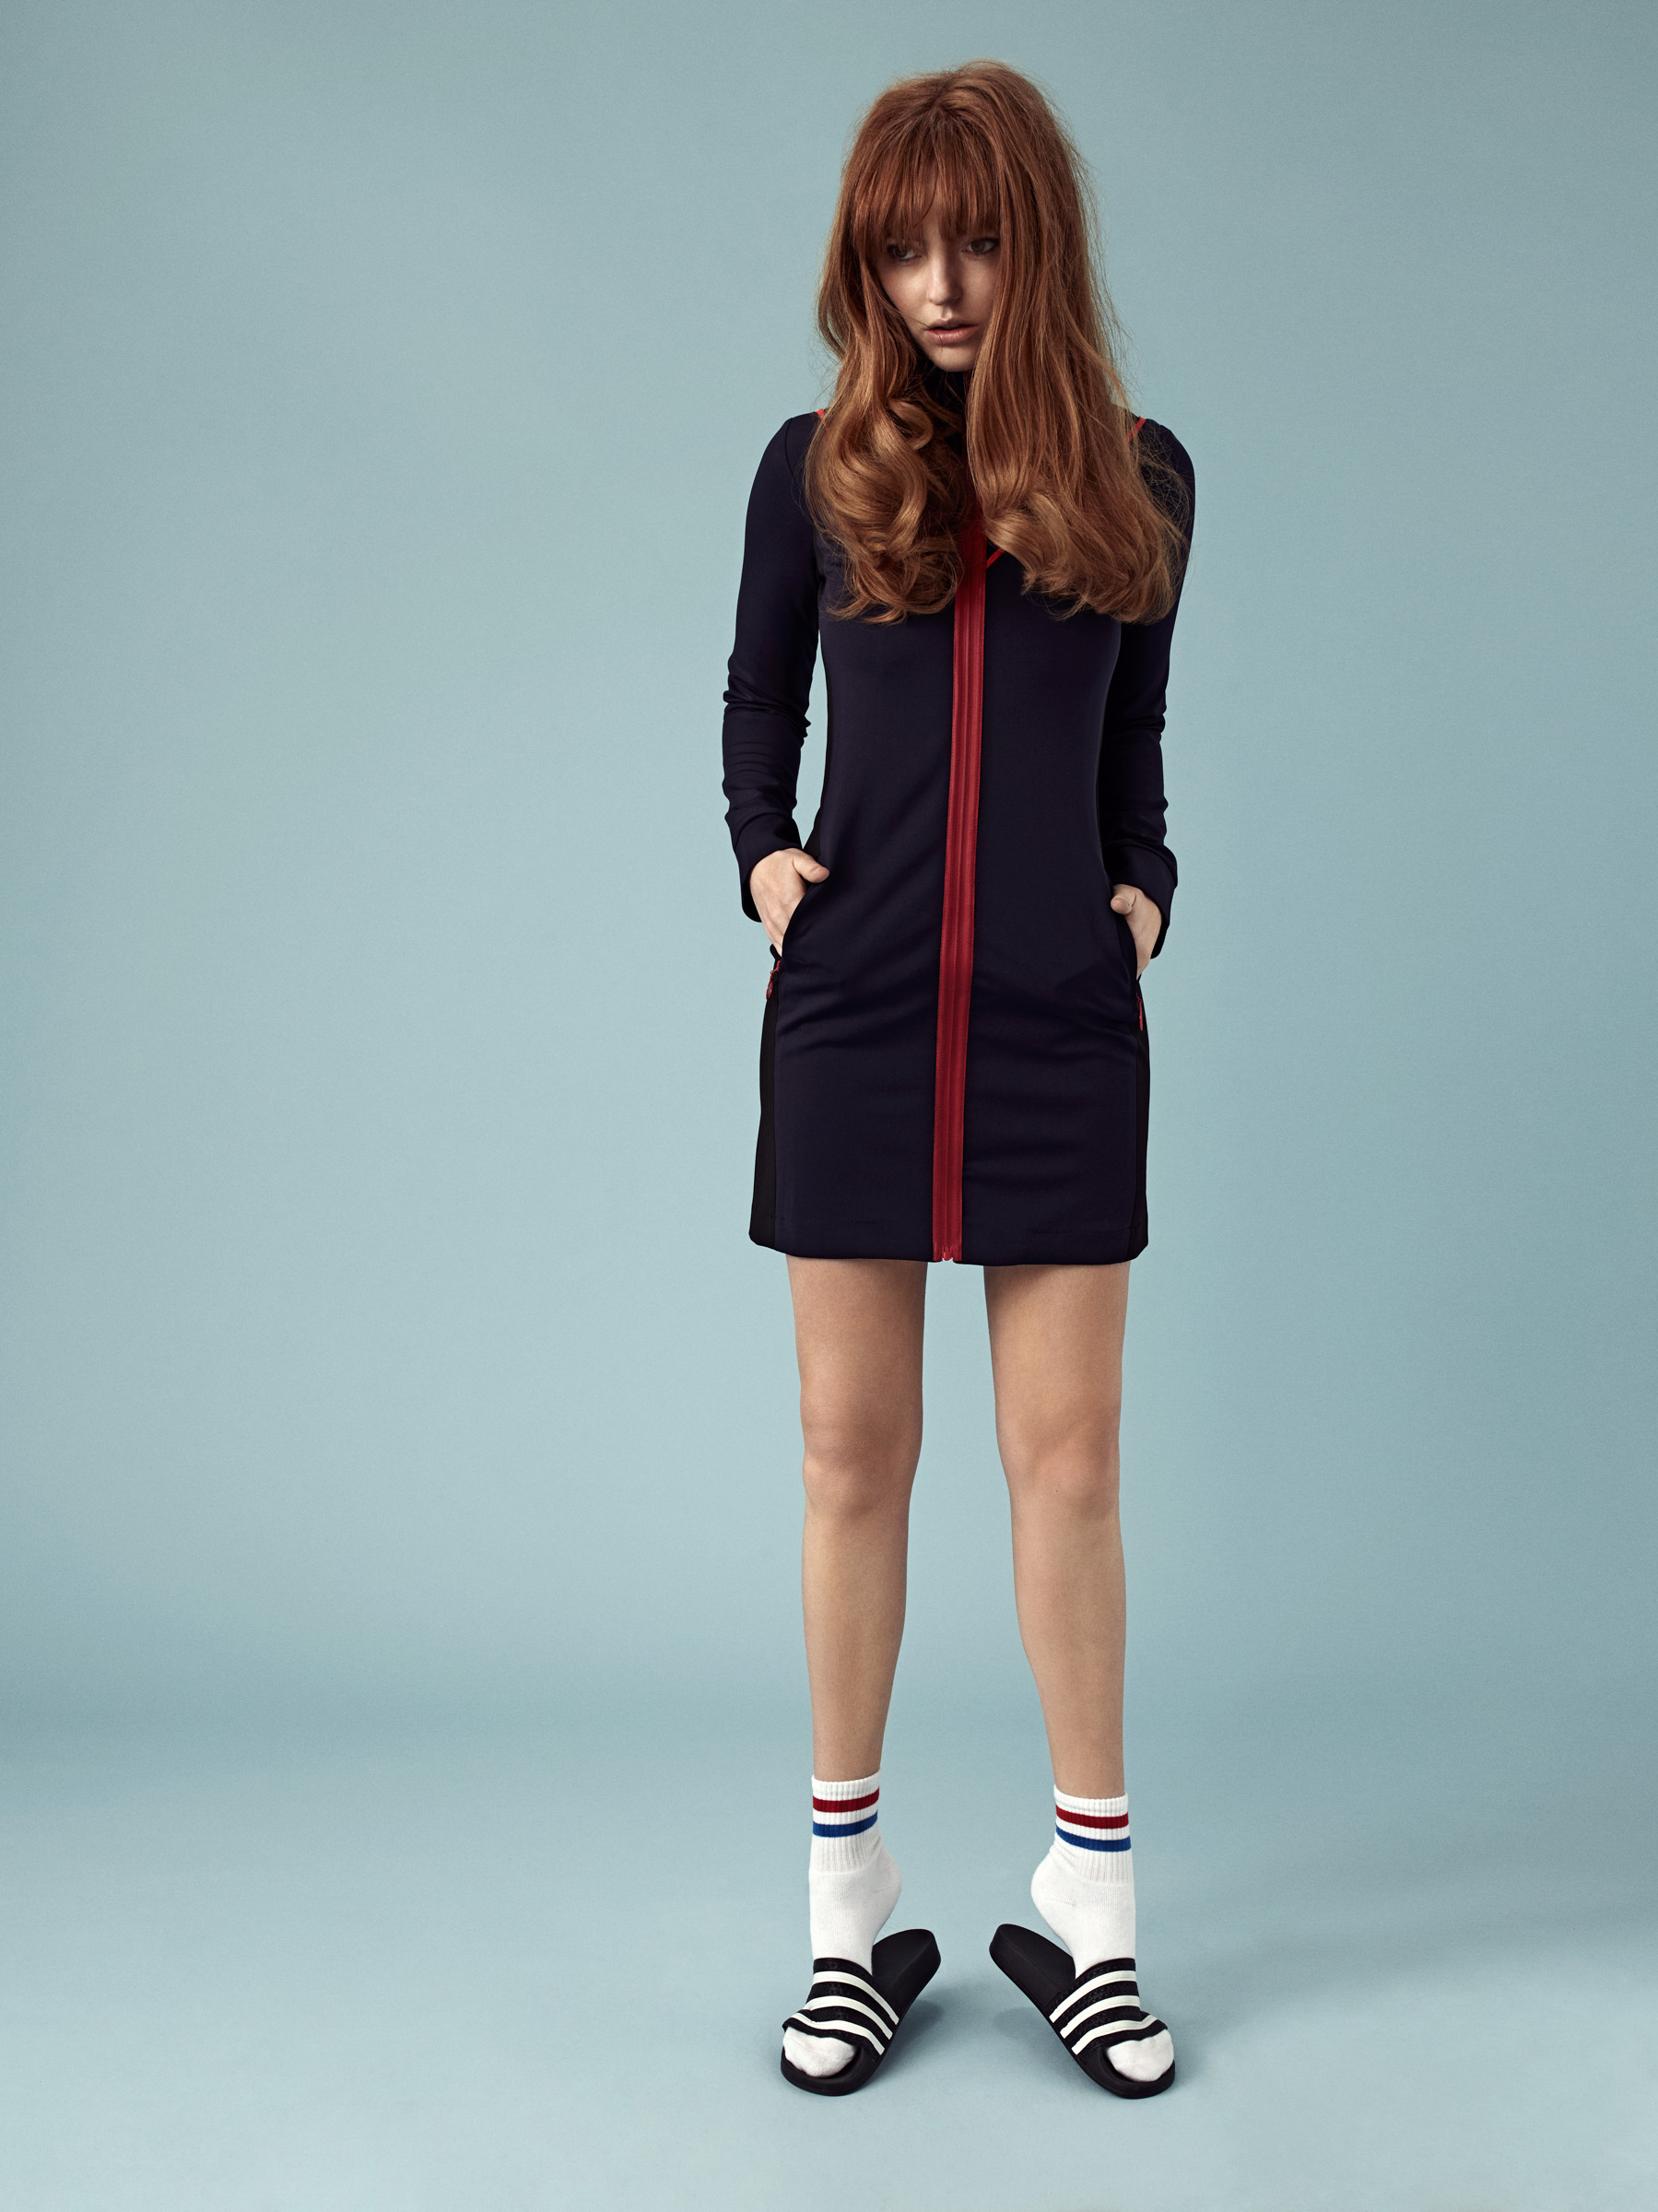 Jack_Eames_Fashion_London_Shot_03.jpg